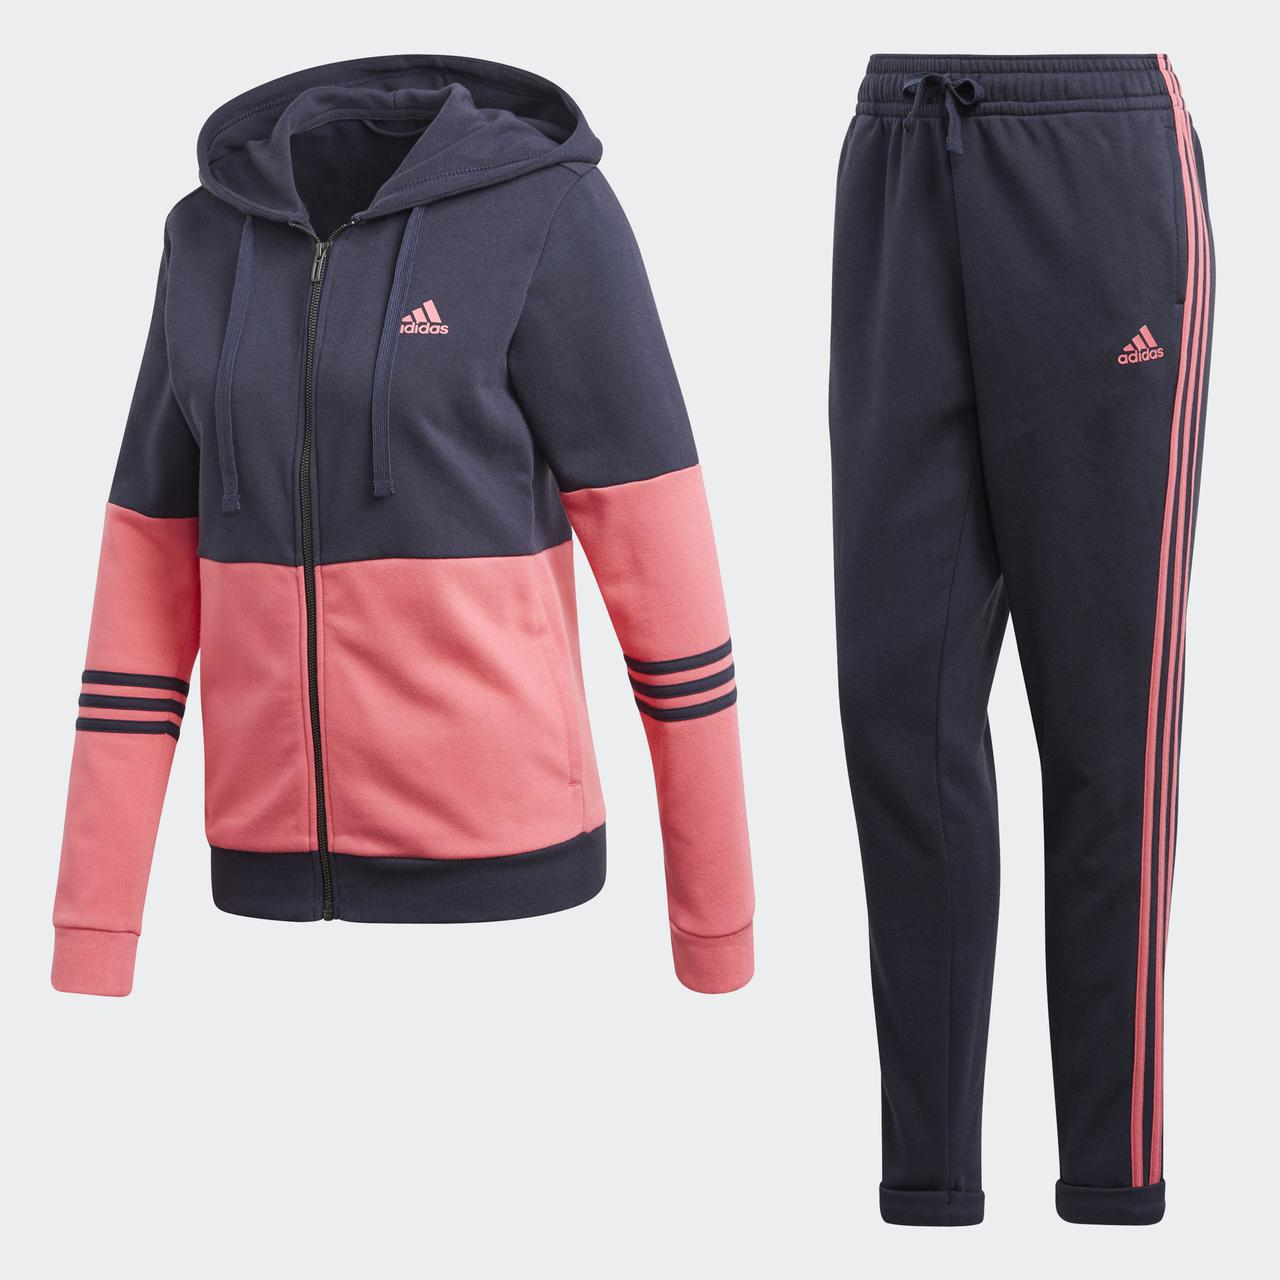 c4c32add Женский спортивный костюм Adidas Performance Energize (Артикул: CW4181)